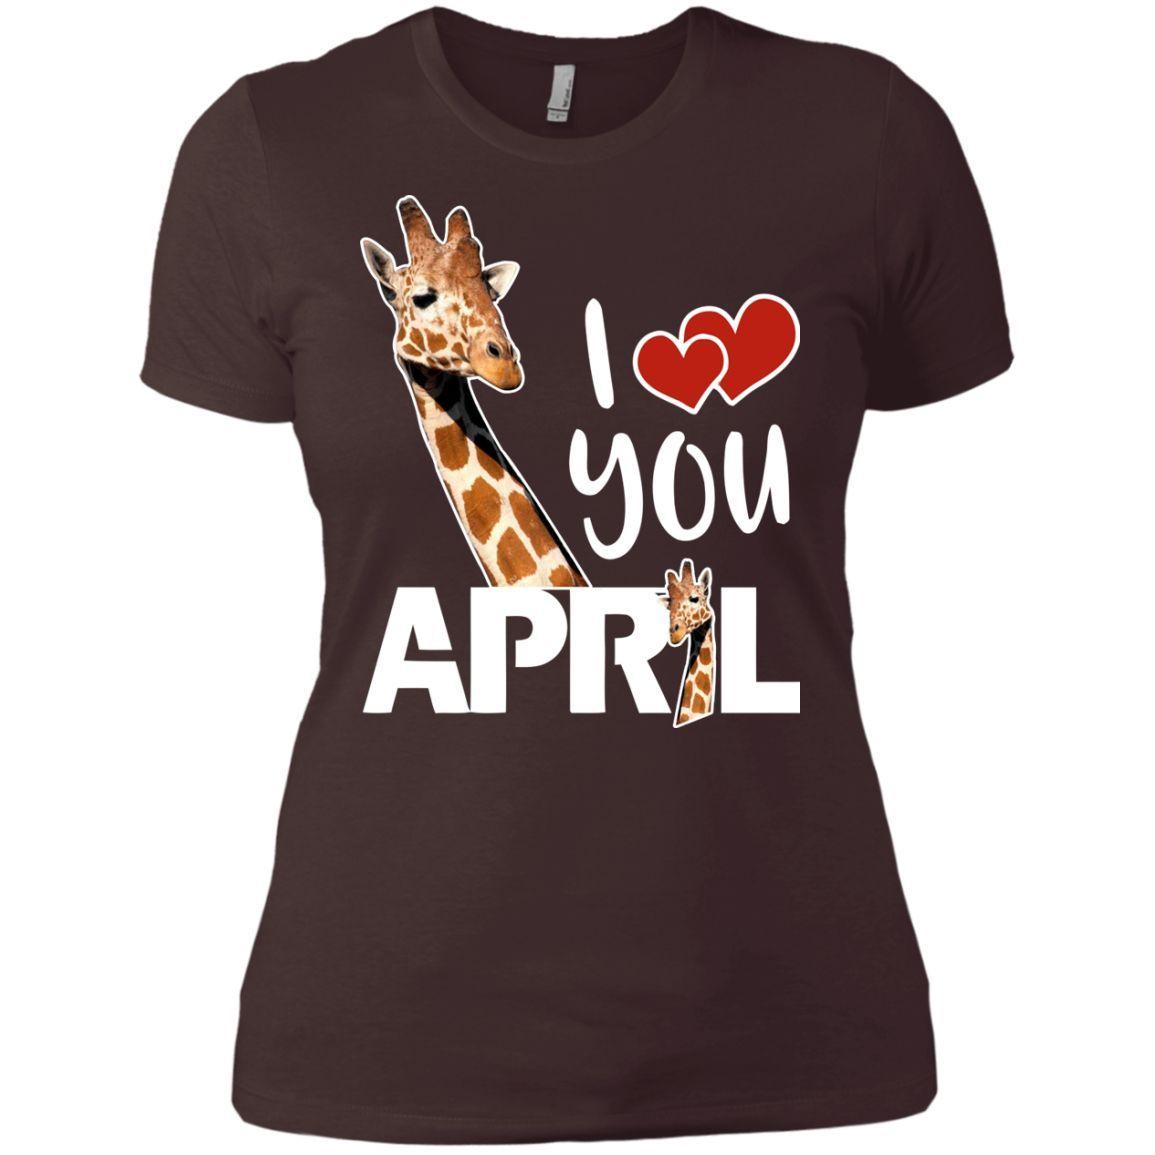 I love you April Giraffe Next Level Ladies' Boyfriend Tee